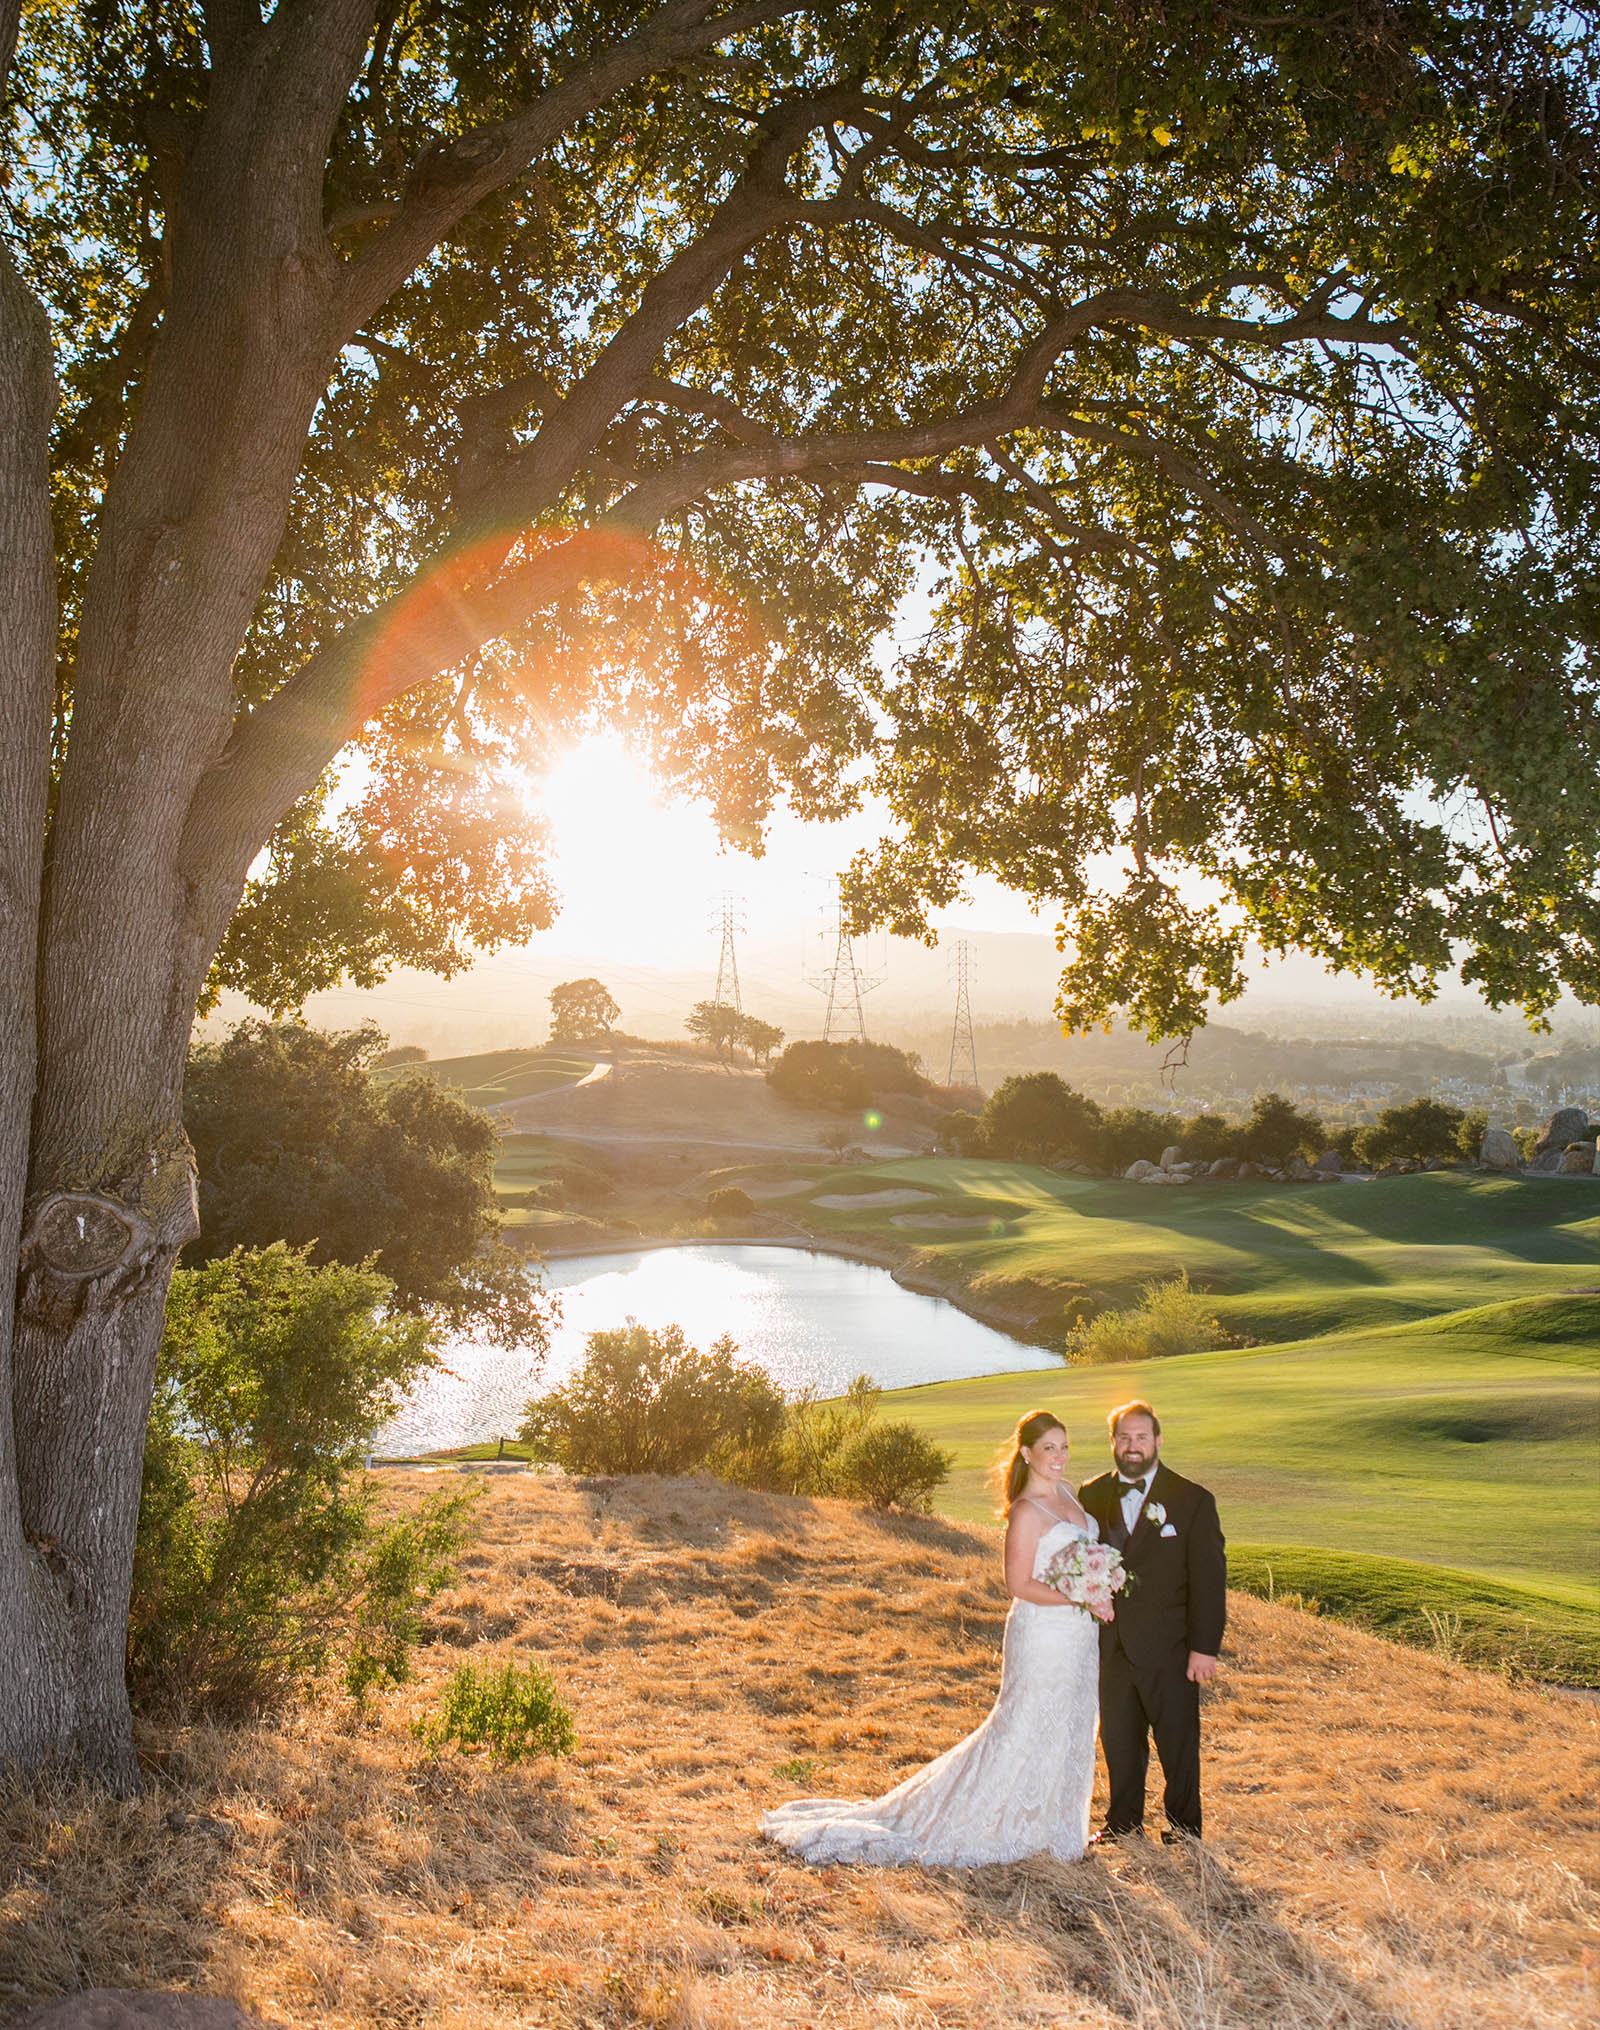 Couple posing with the view - Boulder Ridge - Los Gatos, California - San Jose, California - Santa Clara County - Wedgewood Weddings